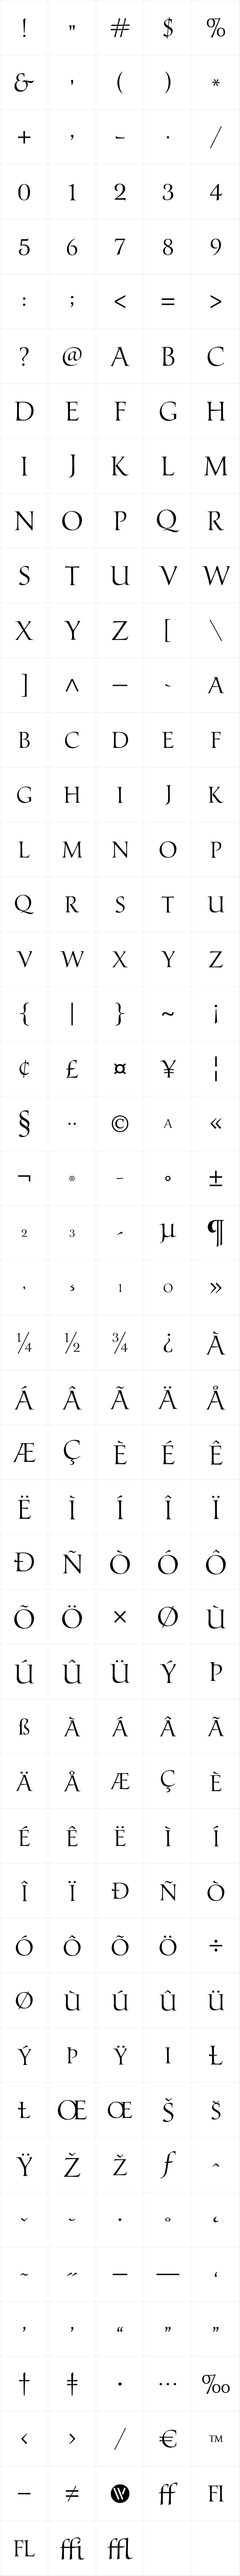 Marcus Small Capitals